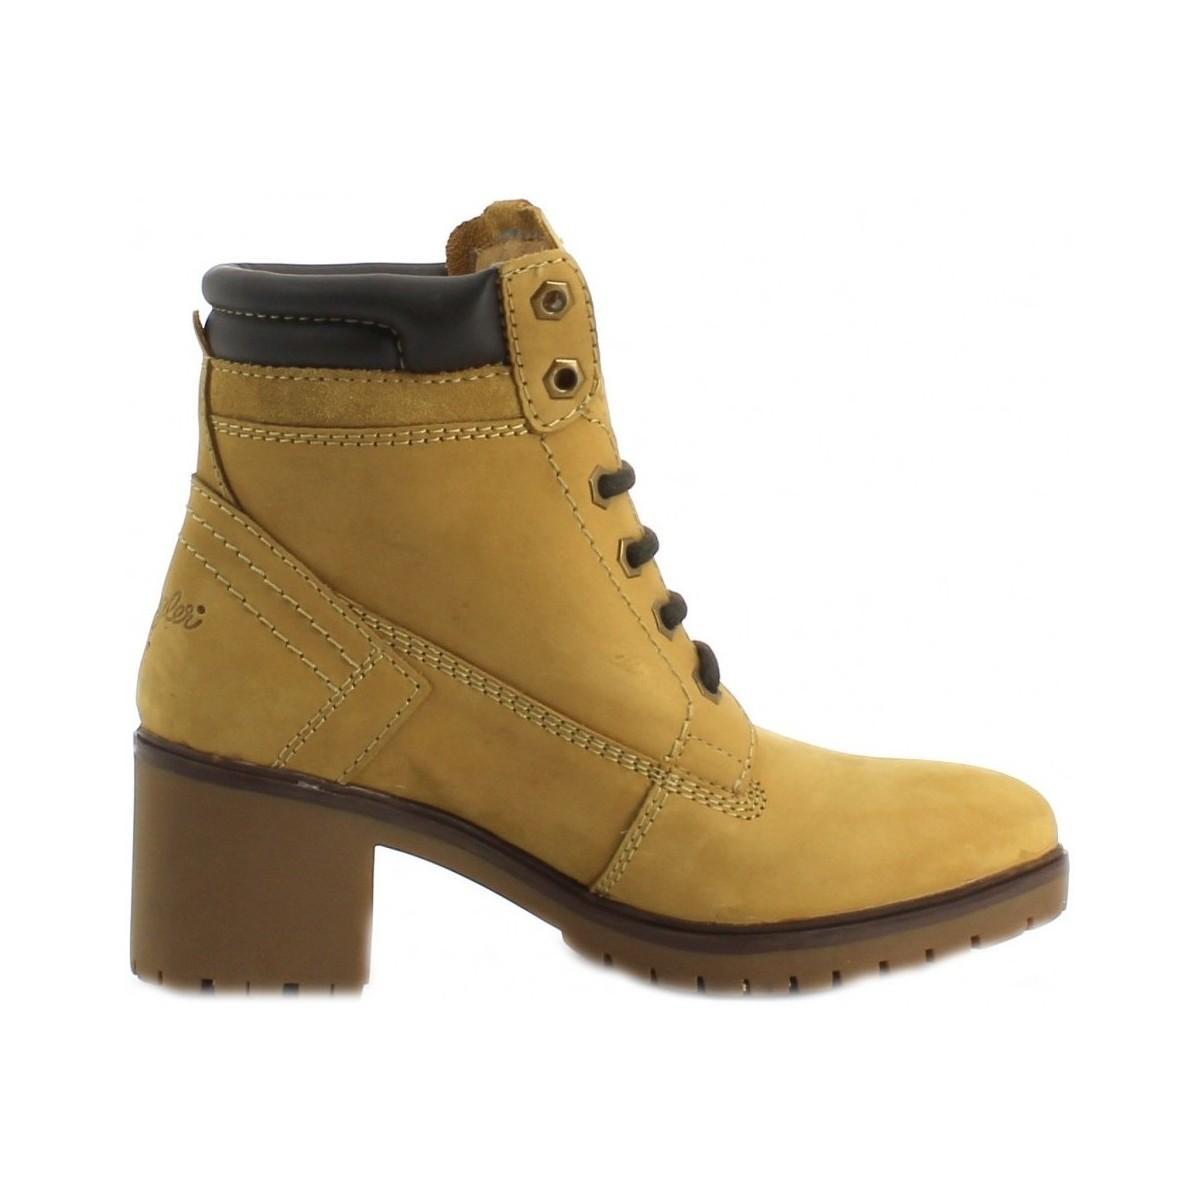 Sierra Femmes Bottines Chaussures Jaunes Pour Lyst Creek En 29EYDHWI